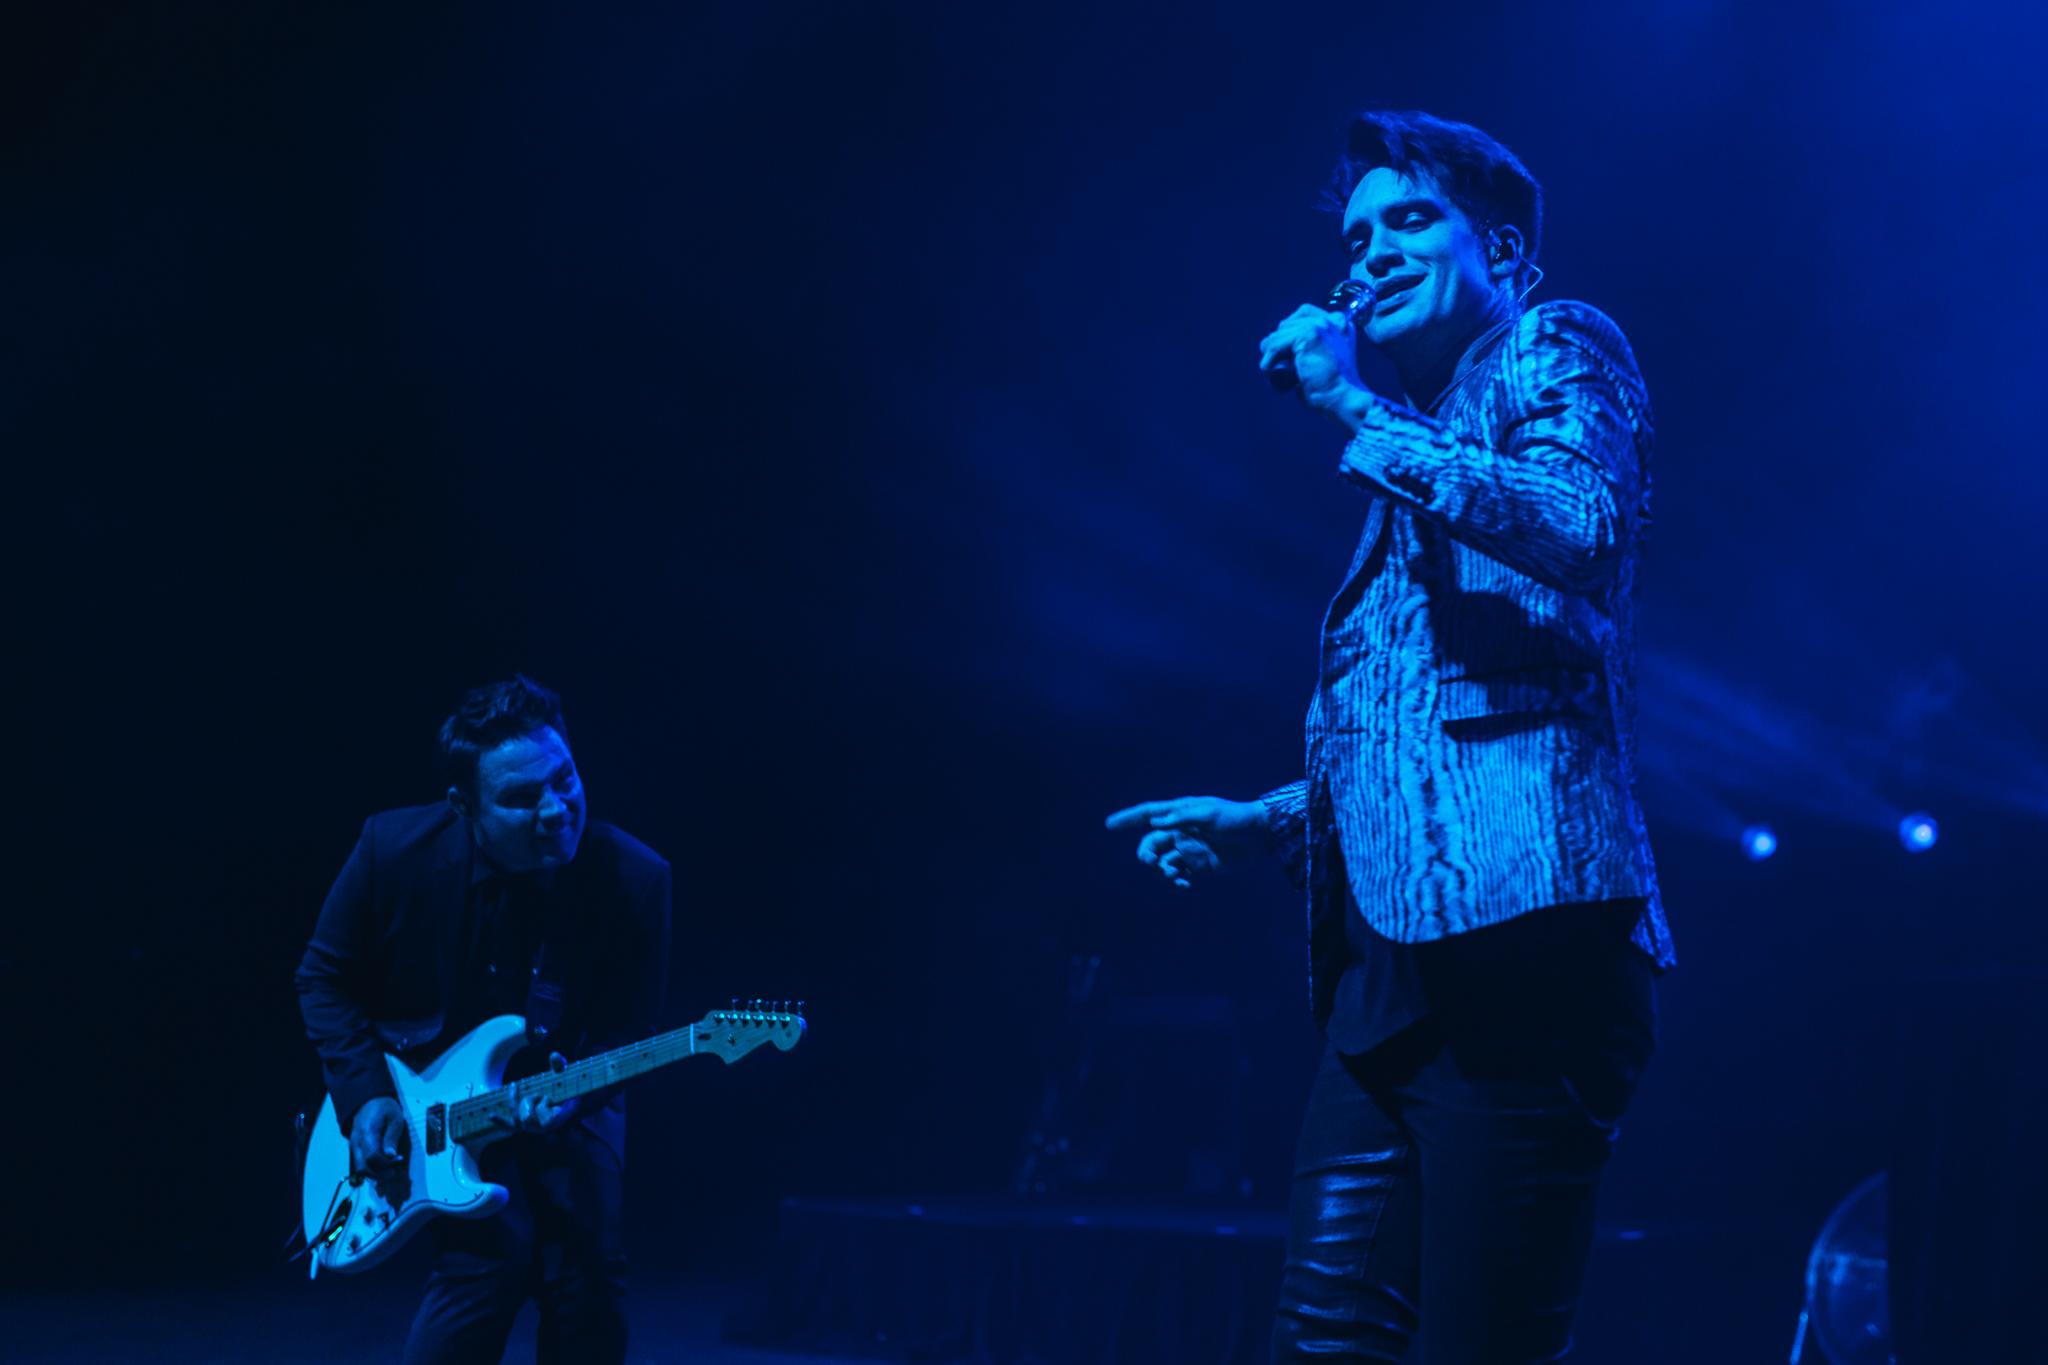 Mitch Lowe Photo - Panic At The Disco - Riverstage-42.jpg